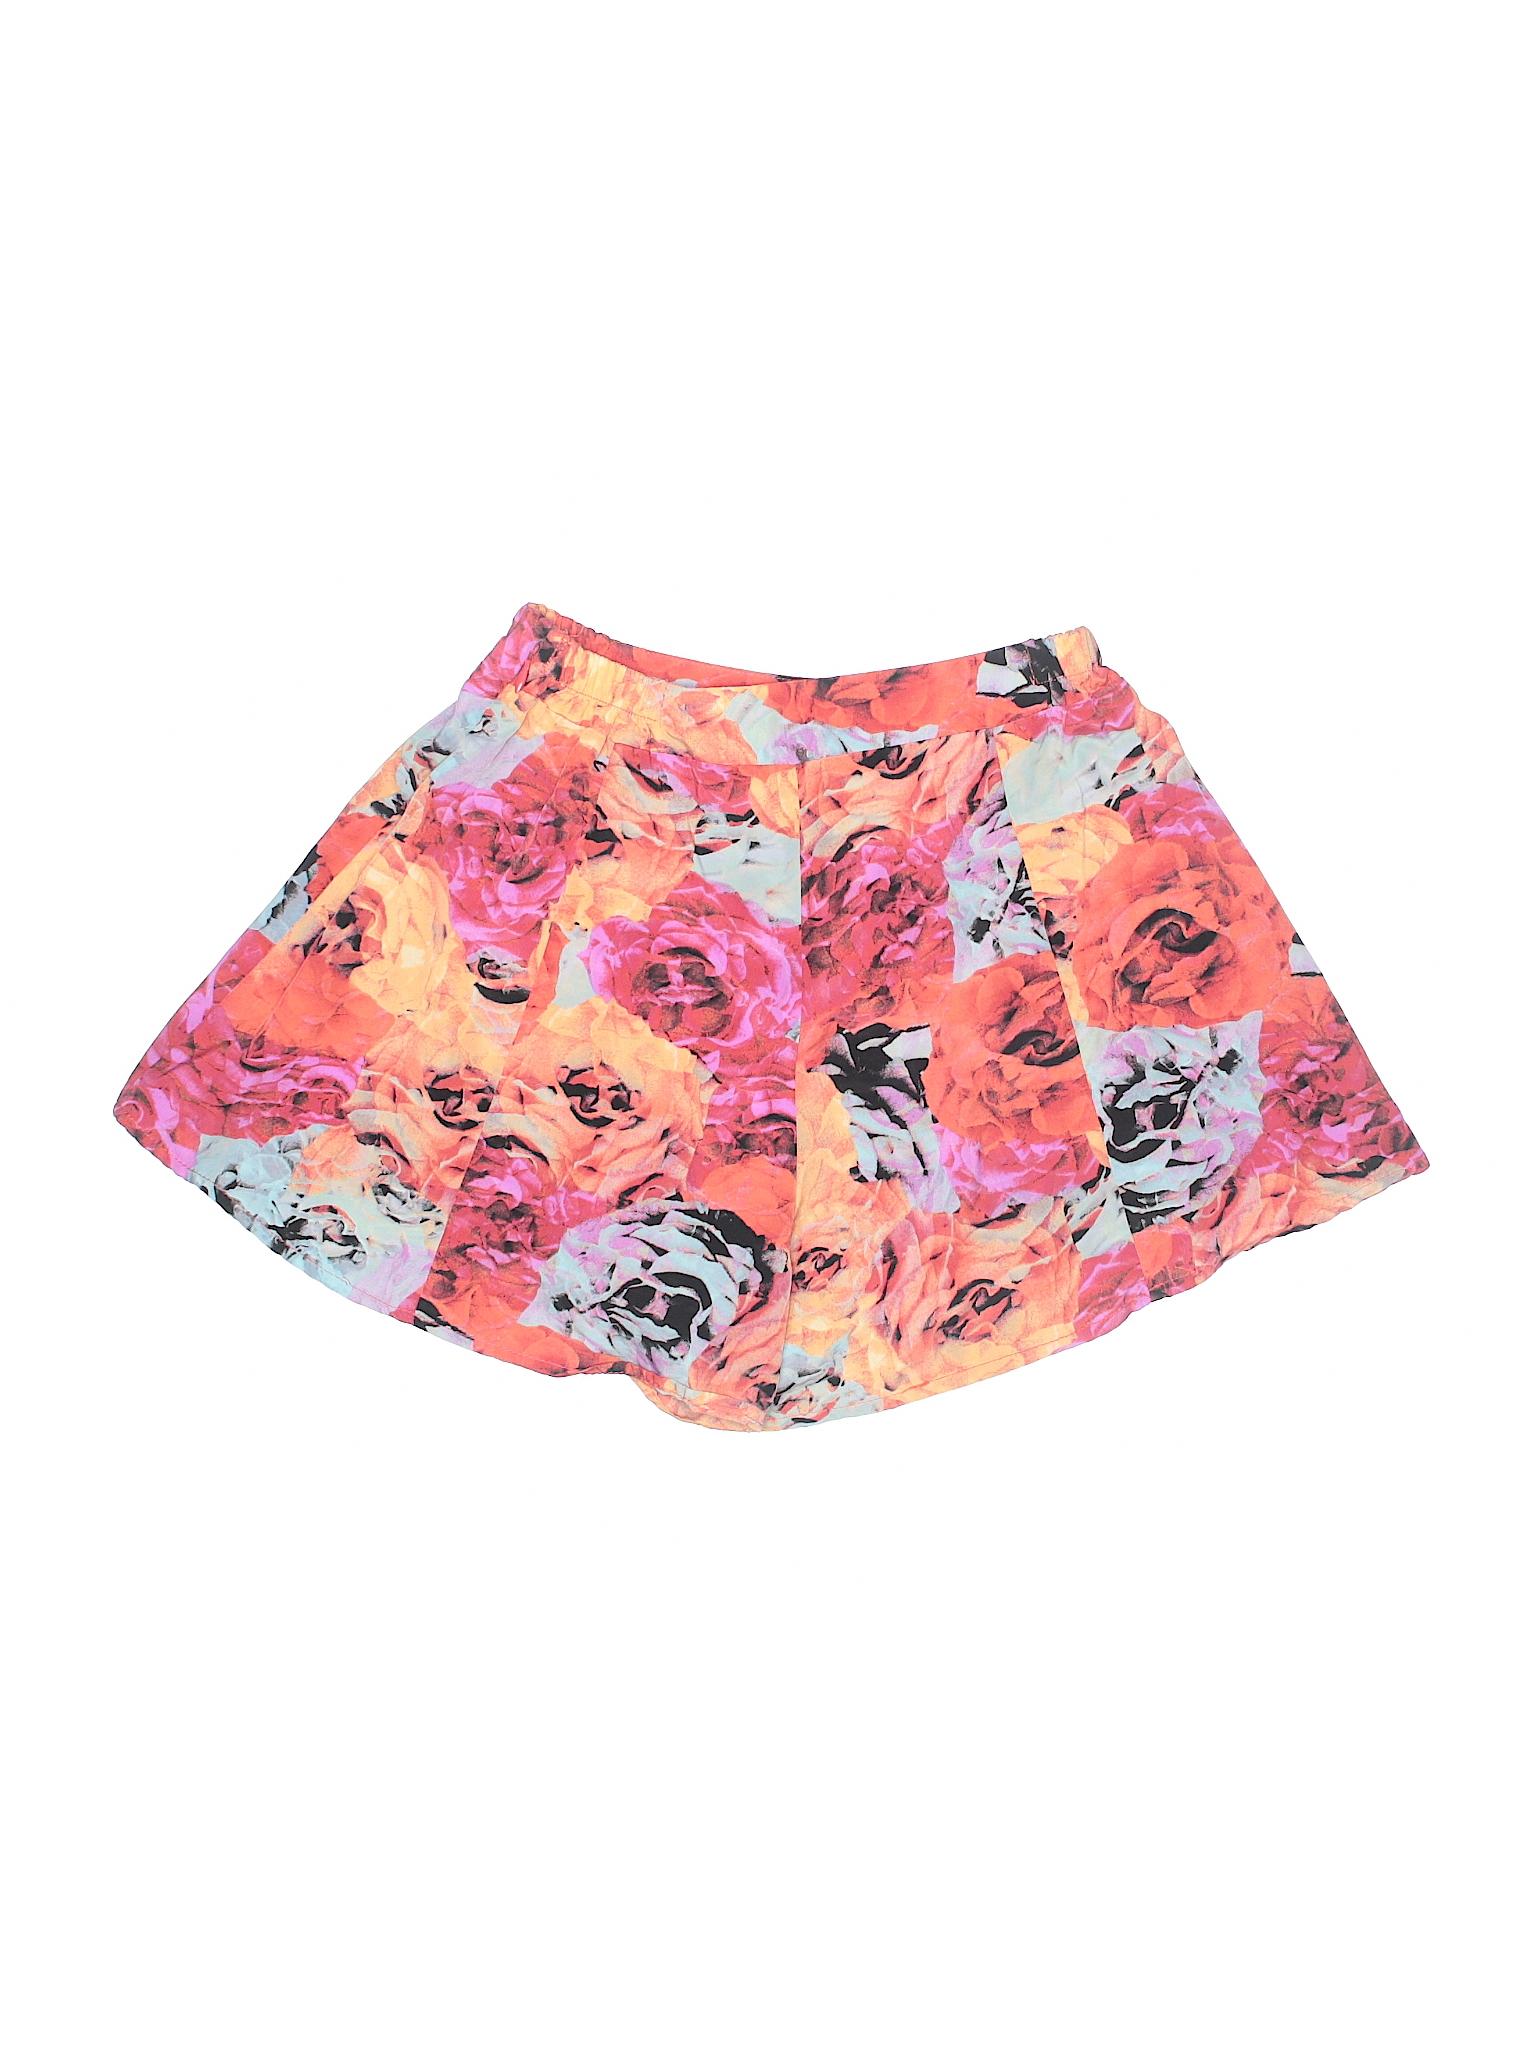 Gal Boutique Boutique Nasty Shorts Nasty Inc Bq4twza5x